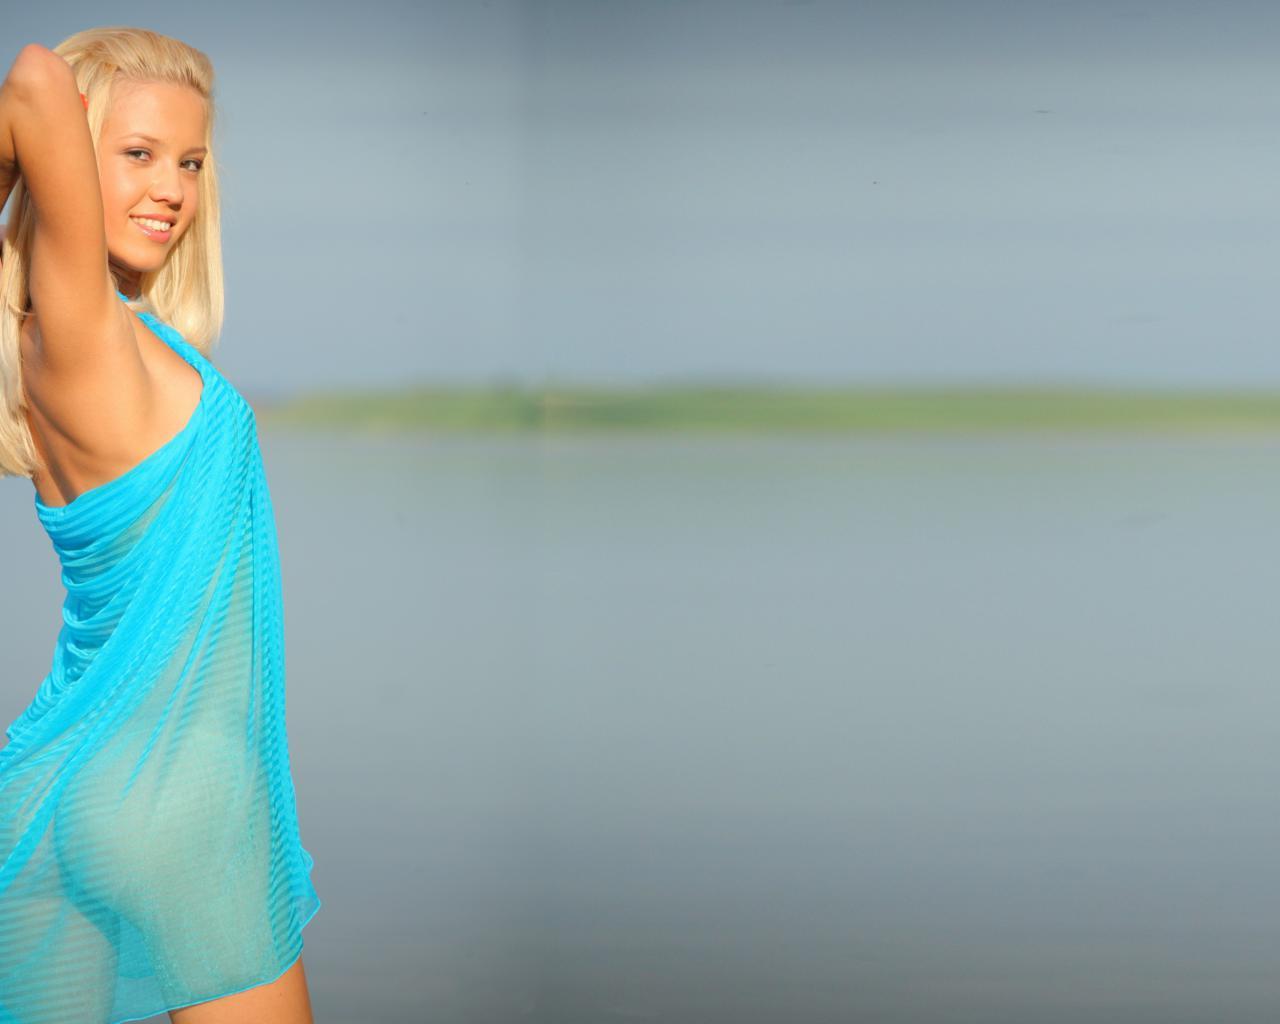 Download photo 1600x1200, marina c, blonde, smile, ass